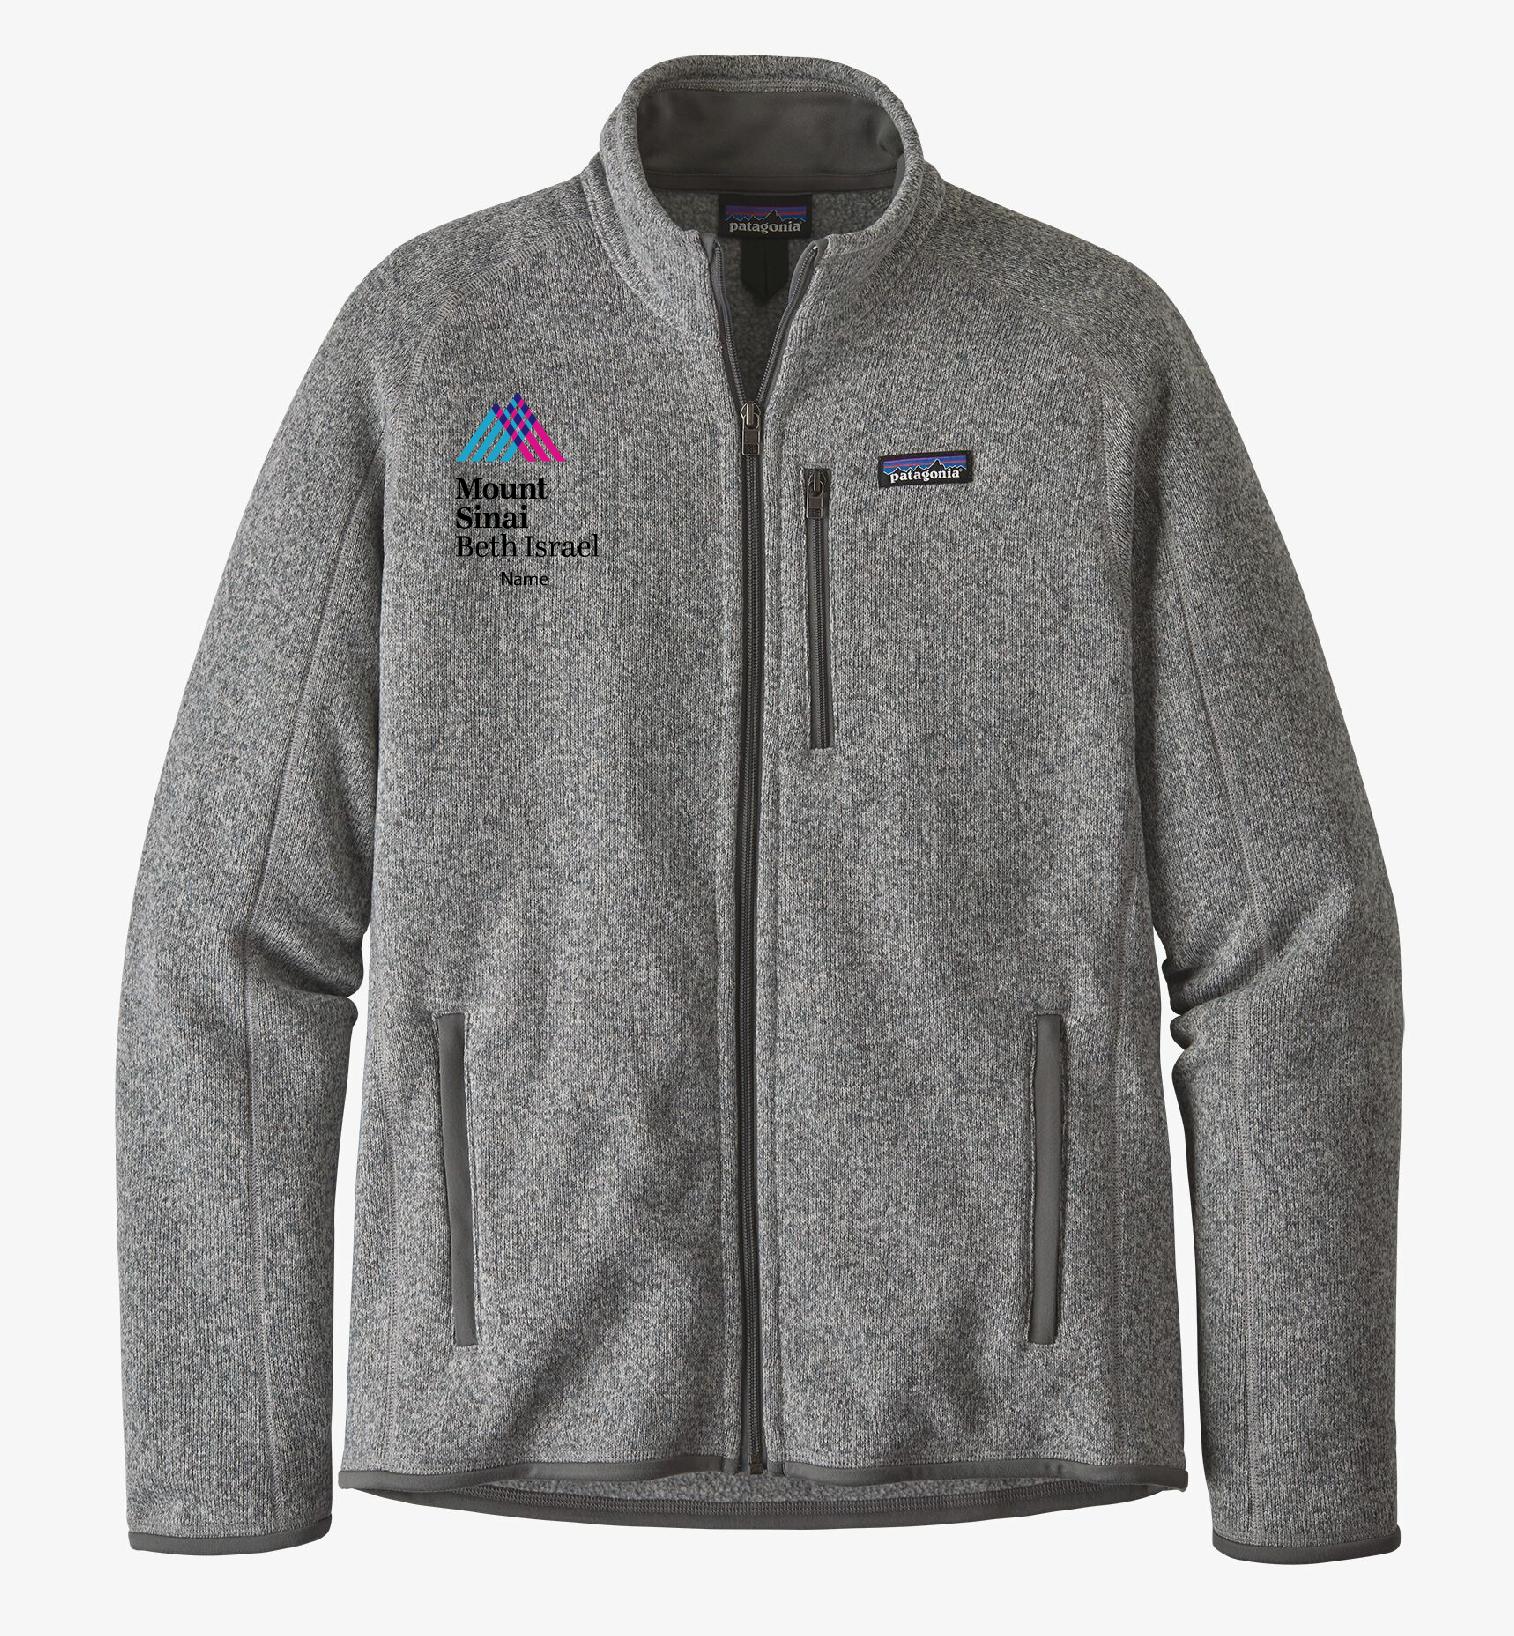 Mount Sinai Beth Israel Men's Patagonia Better Sweater Fleece Jacket